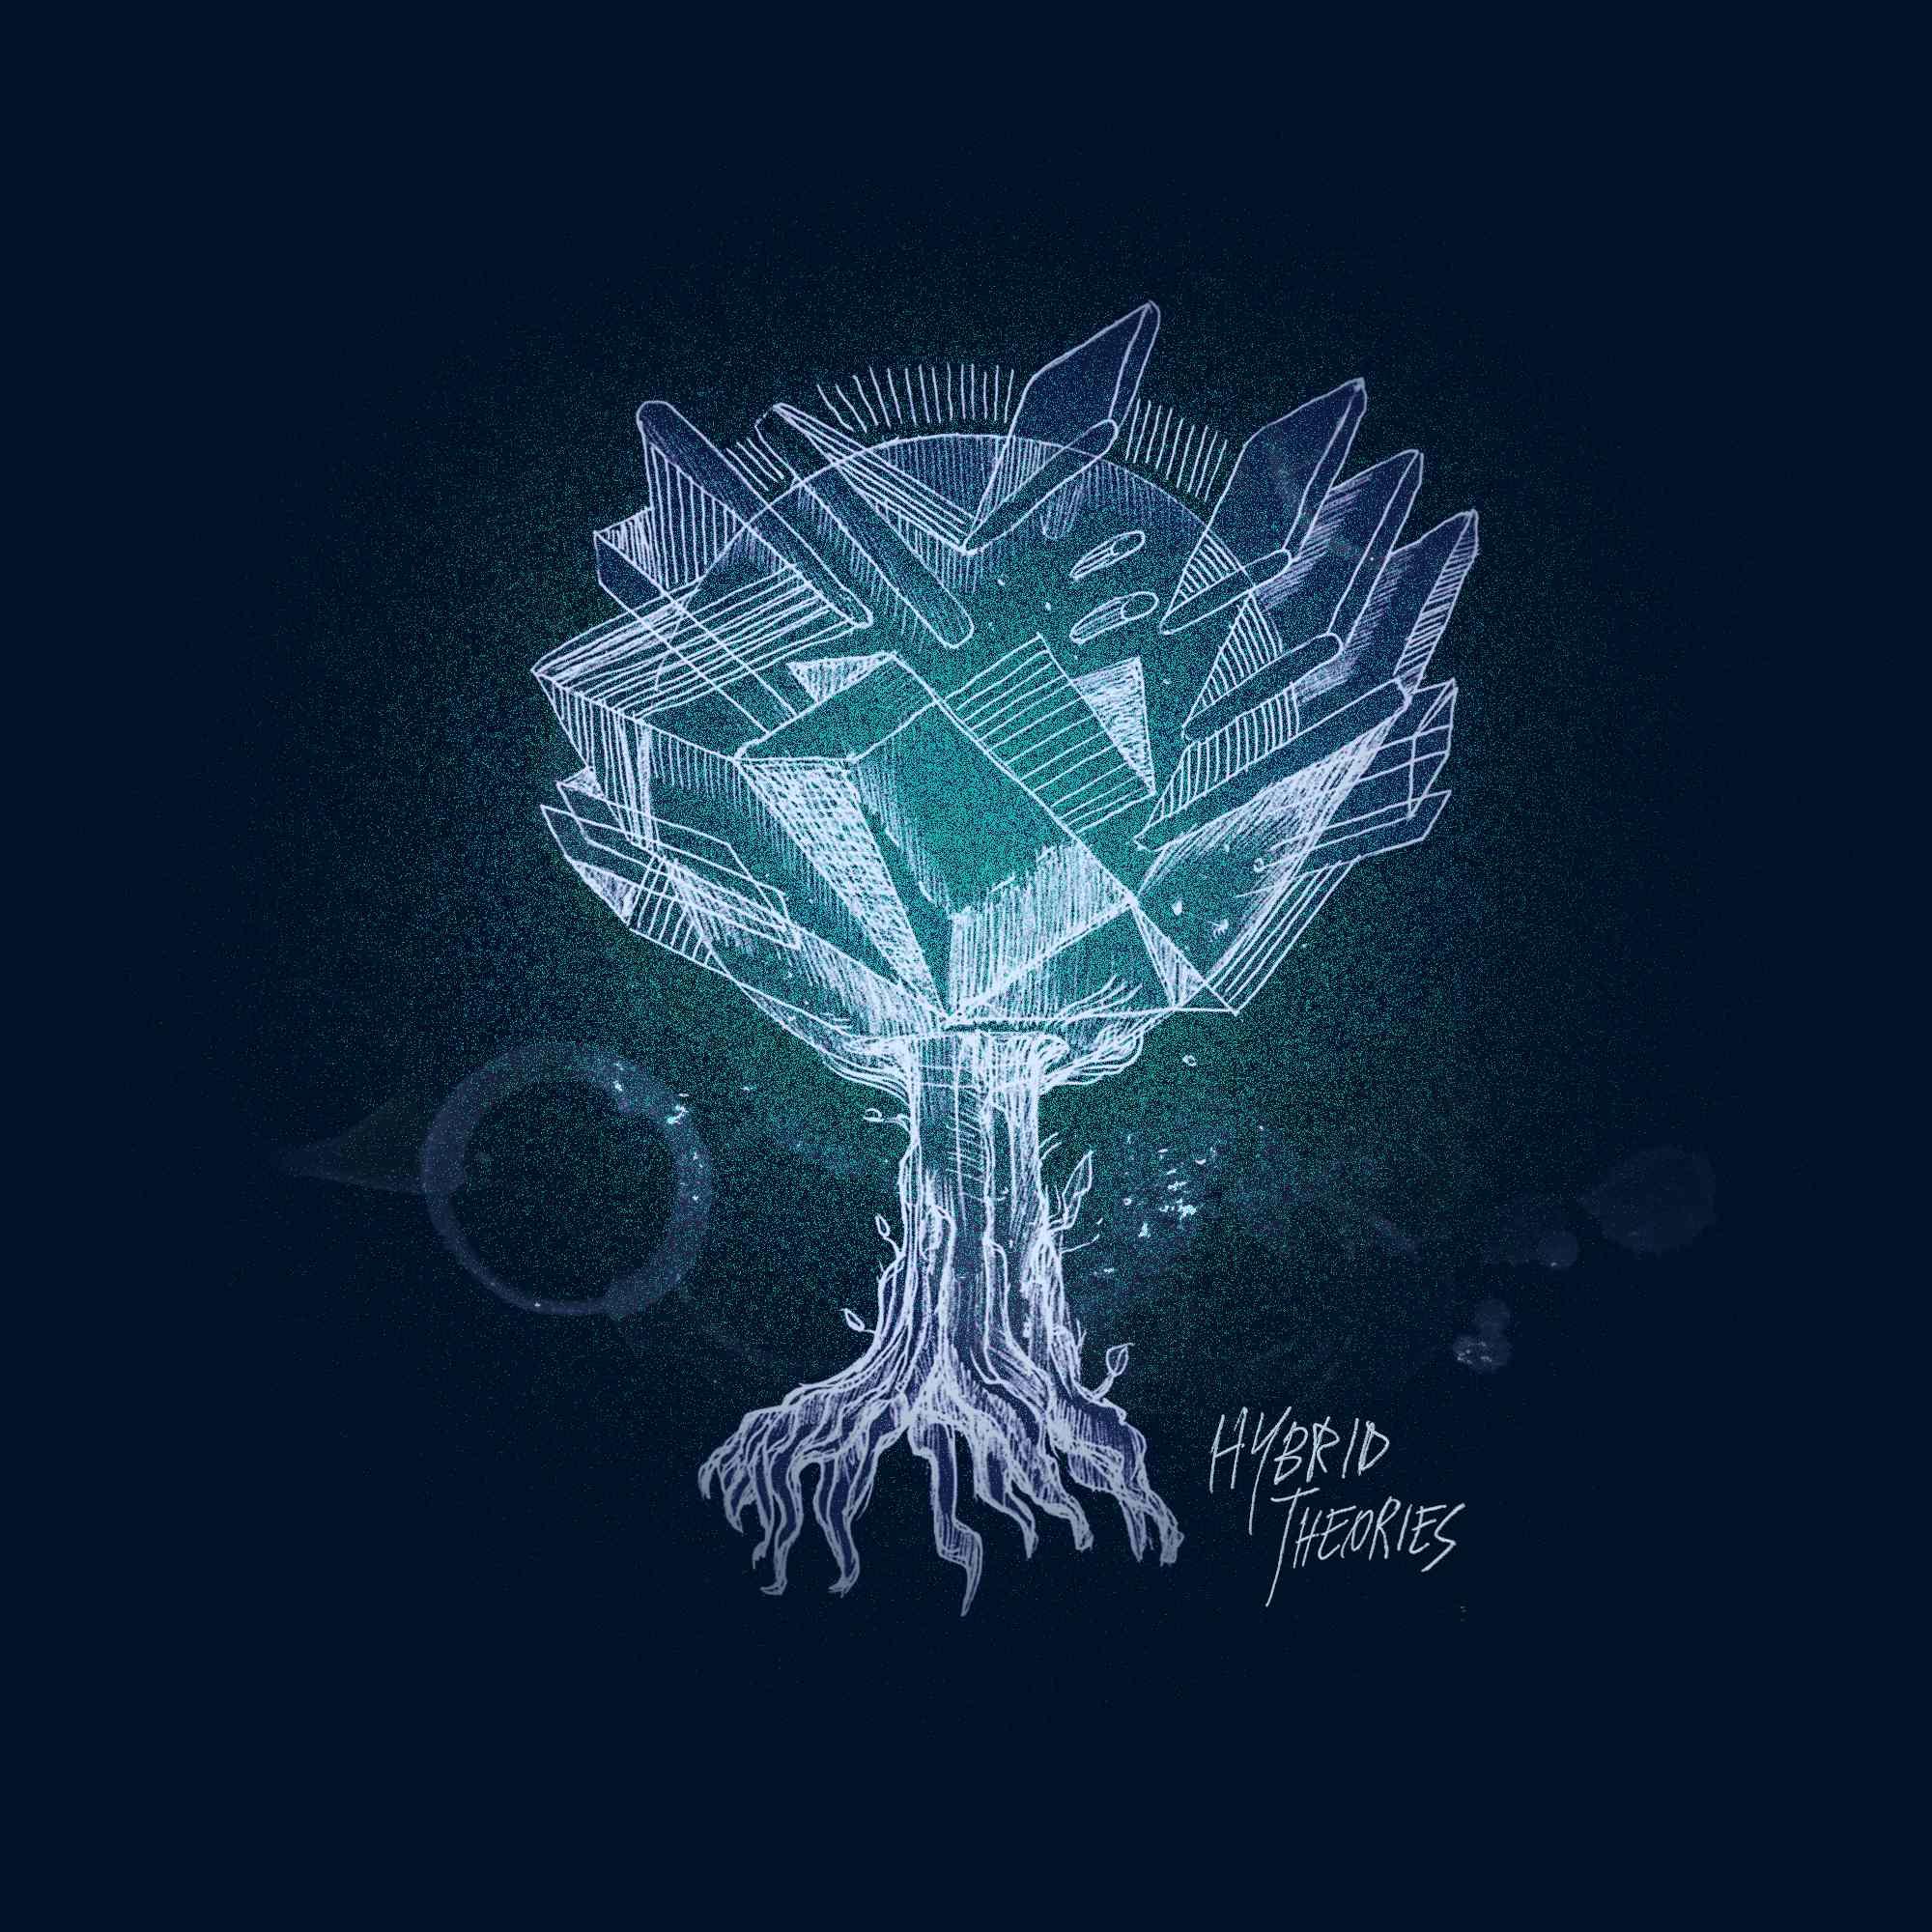 Hybrid Theories_Artwork